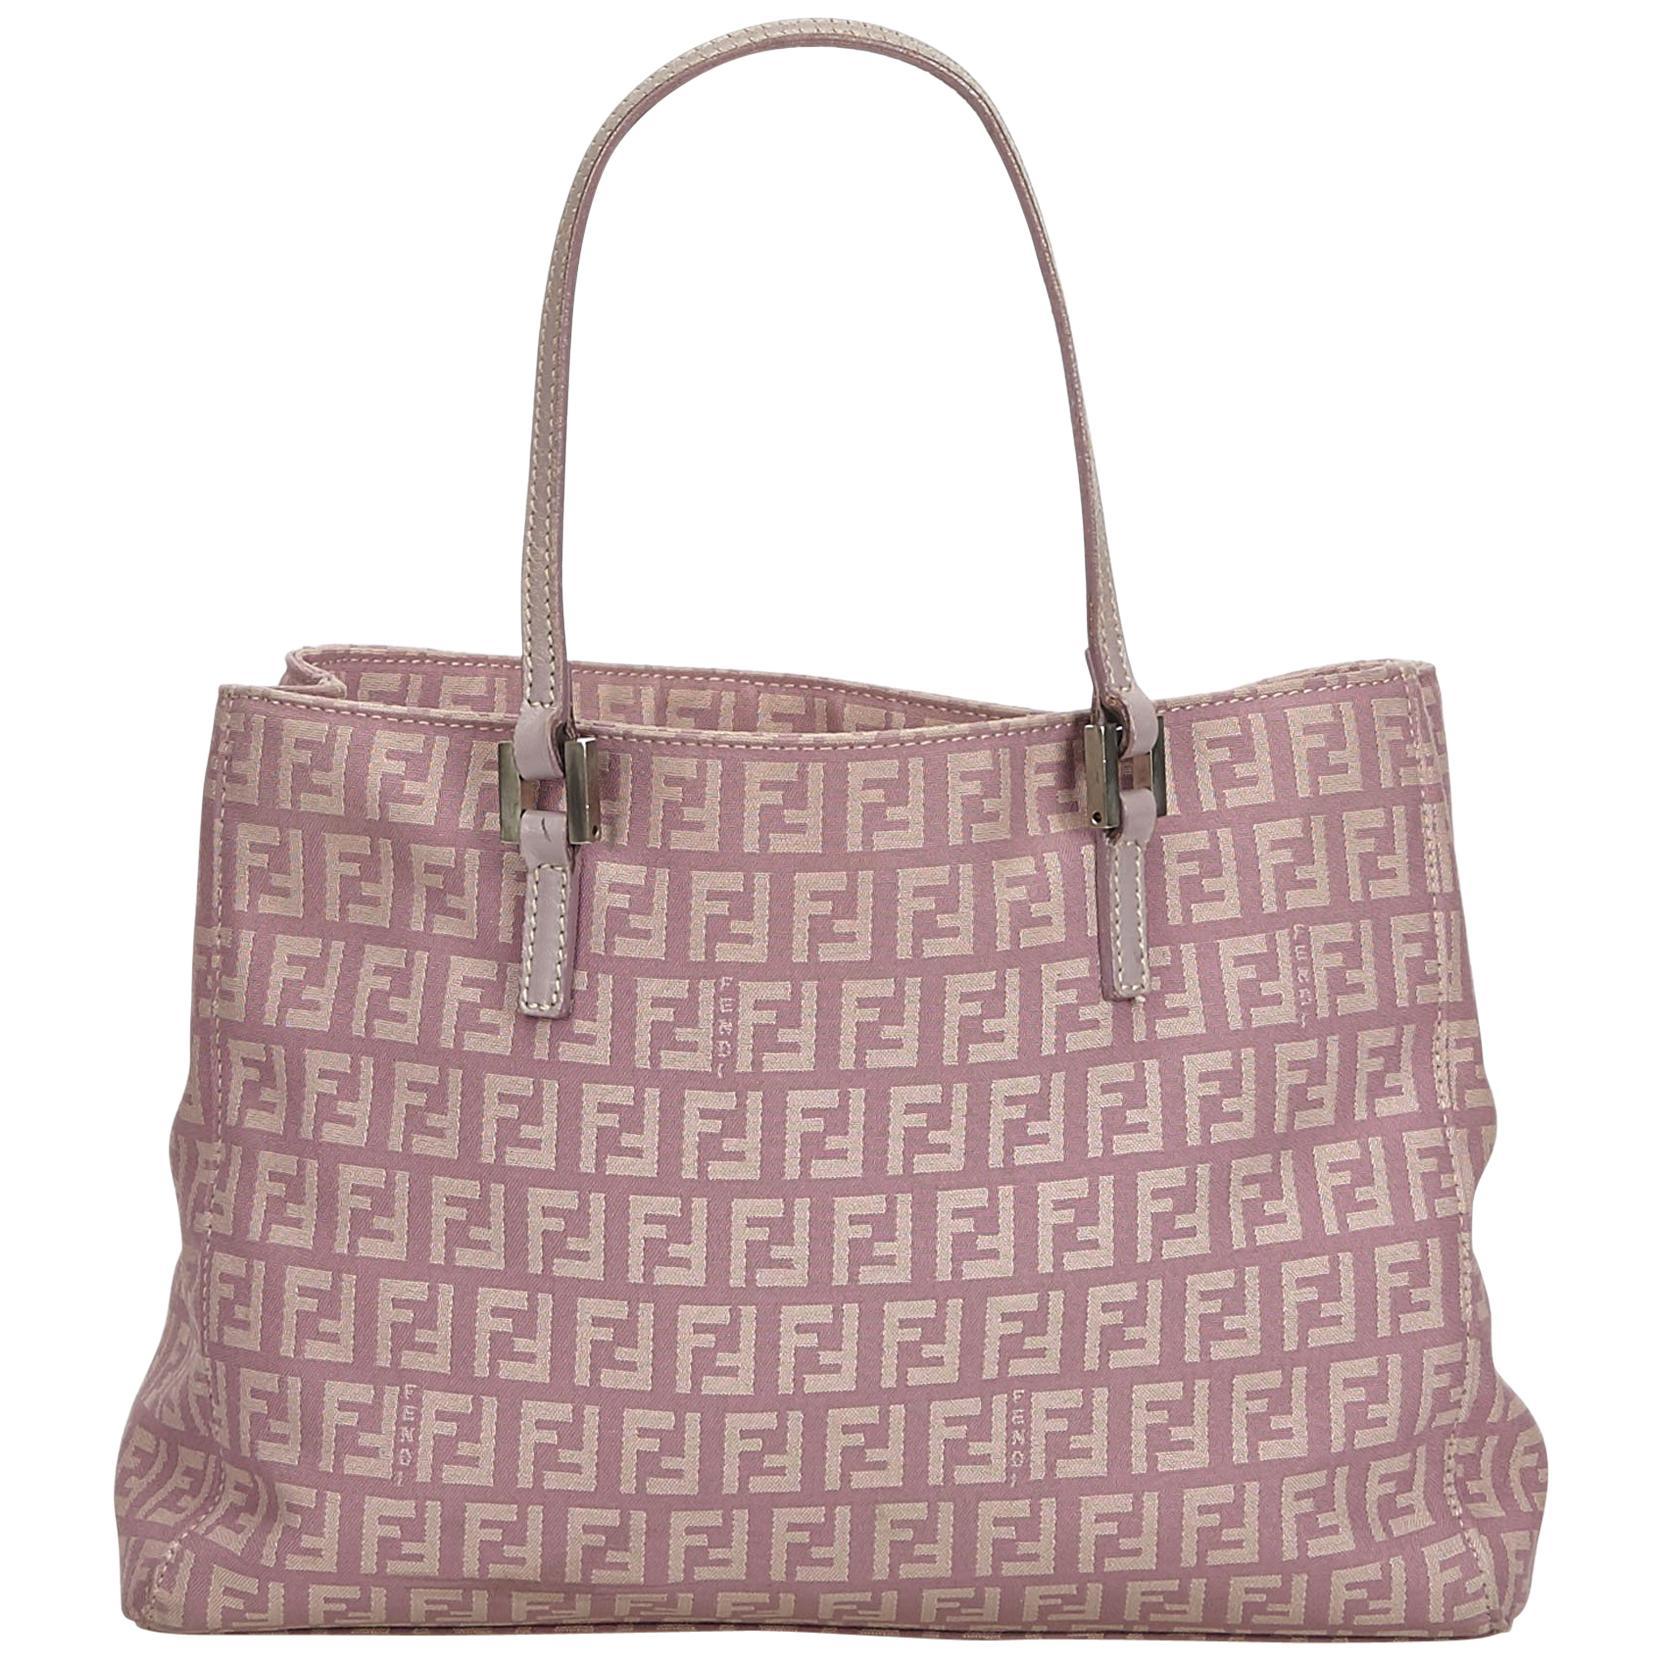 3d4aed173db5 Fendi pink zucchino canvas tote bag at stdibs jpg 768x768 Fendi canvas bag